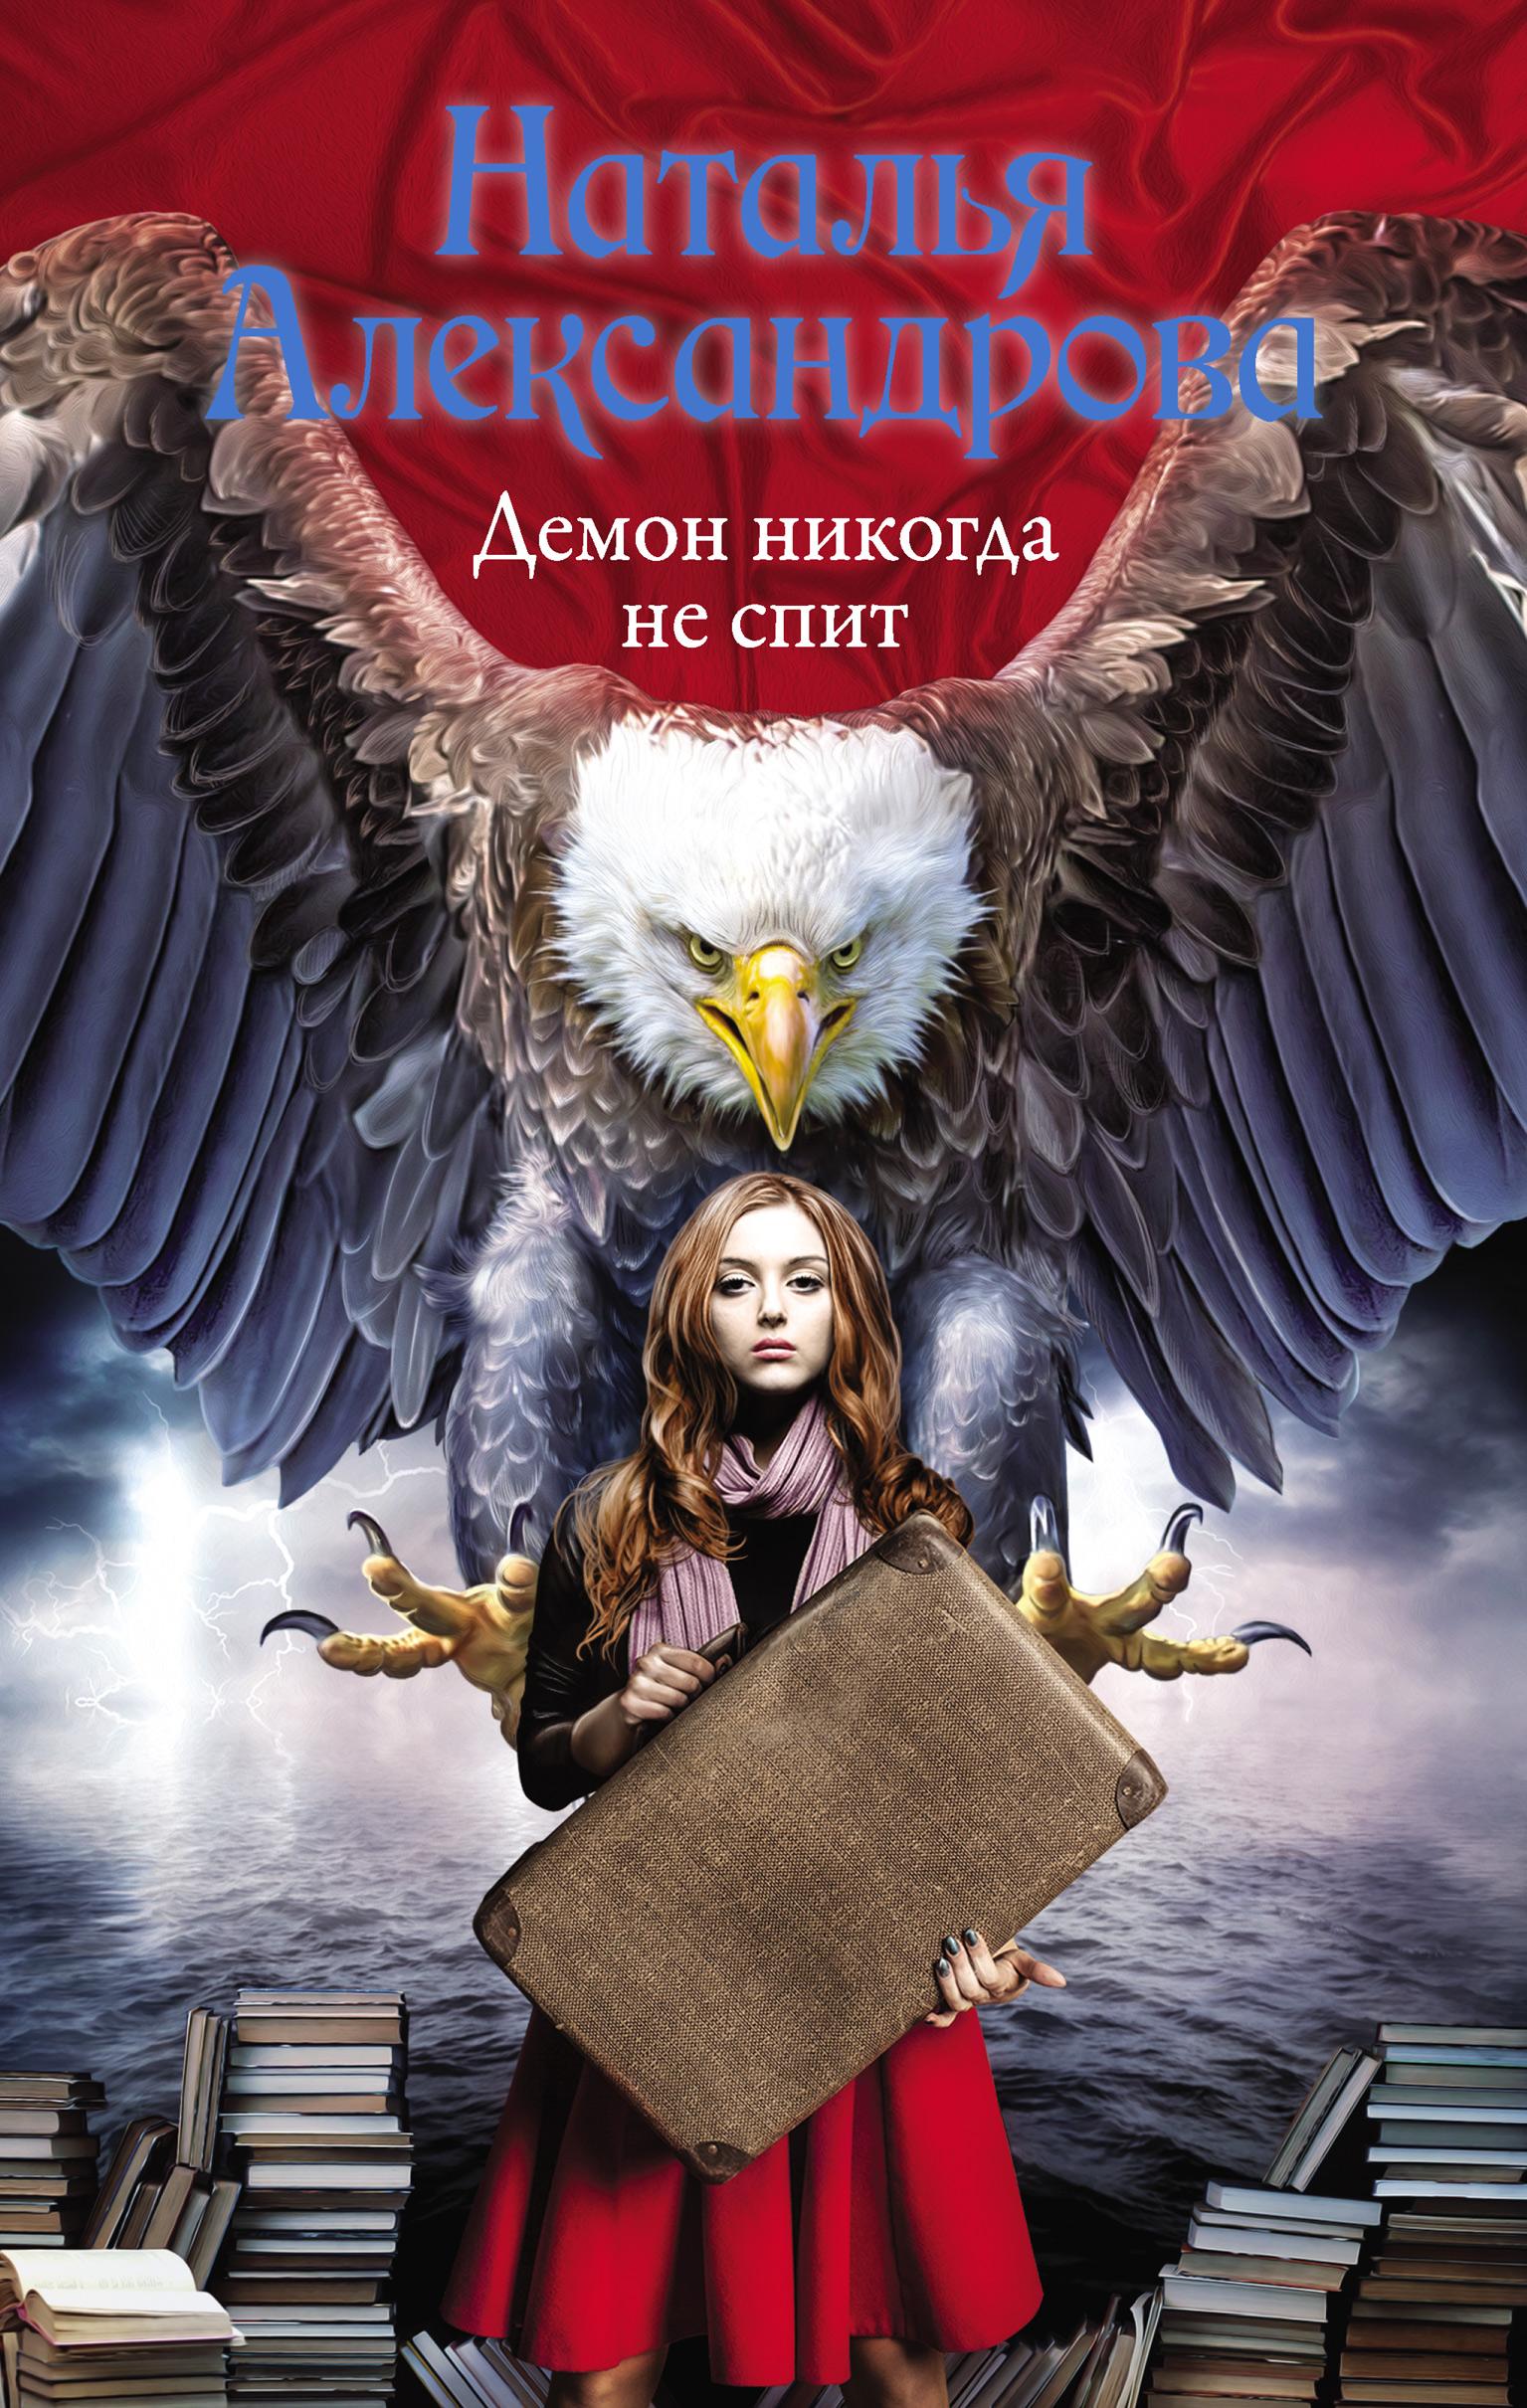 цена на Наталья Александрова Демон никогда не спит